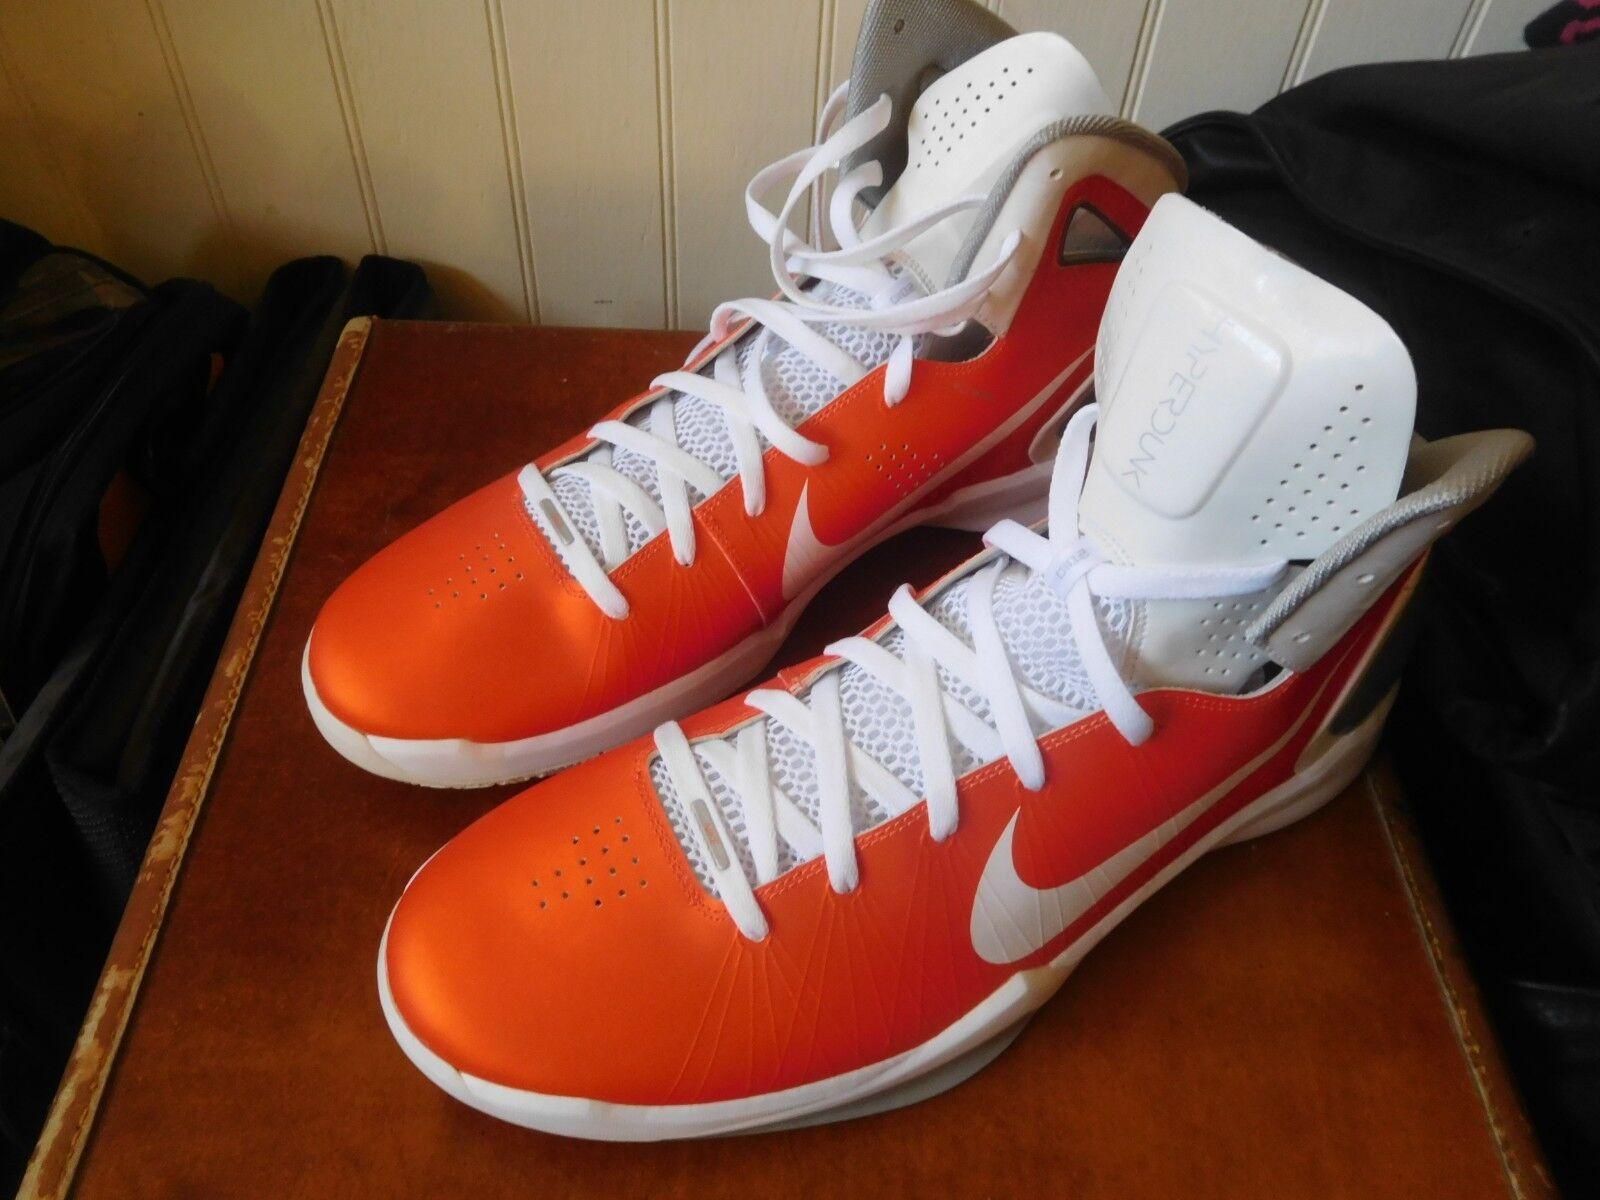 NEW 2010 NIKE HYPERDUNK BASKETBALL SHOES 16 D orange WHITE NEVER WORN PERFECT